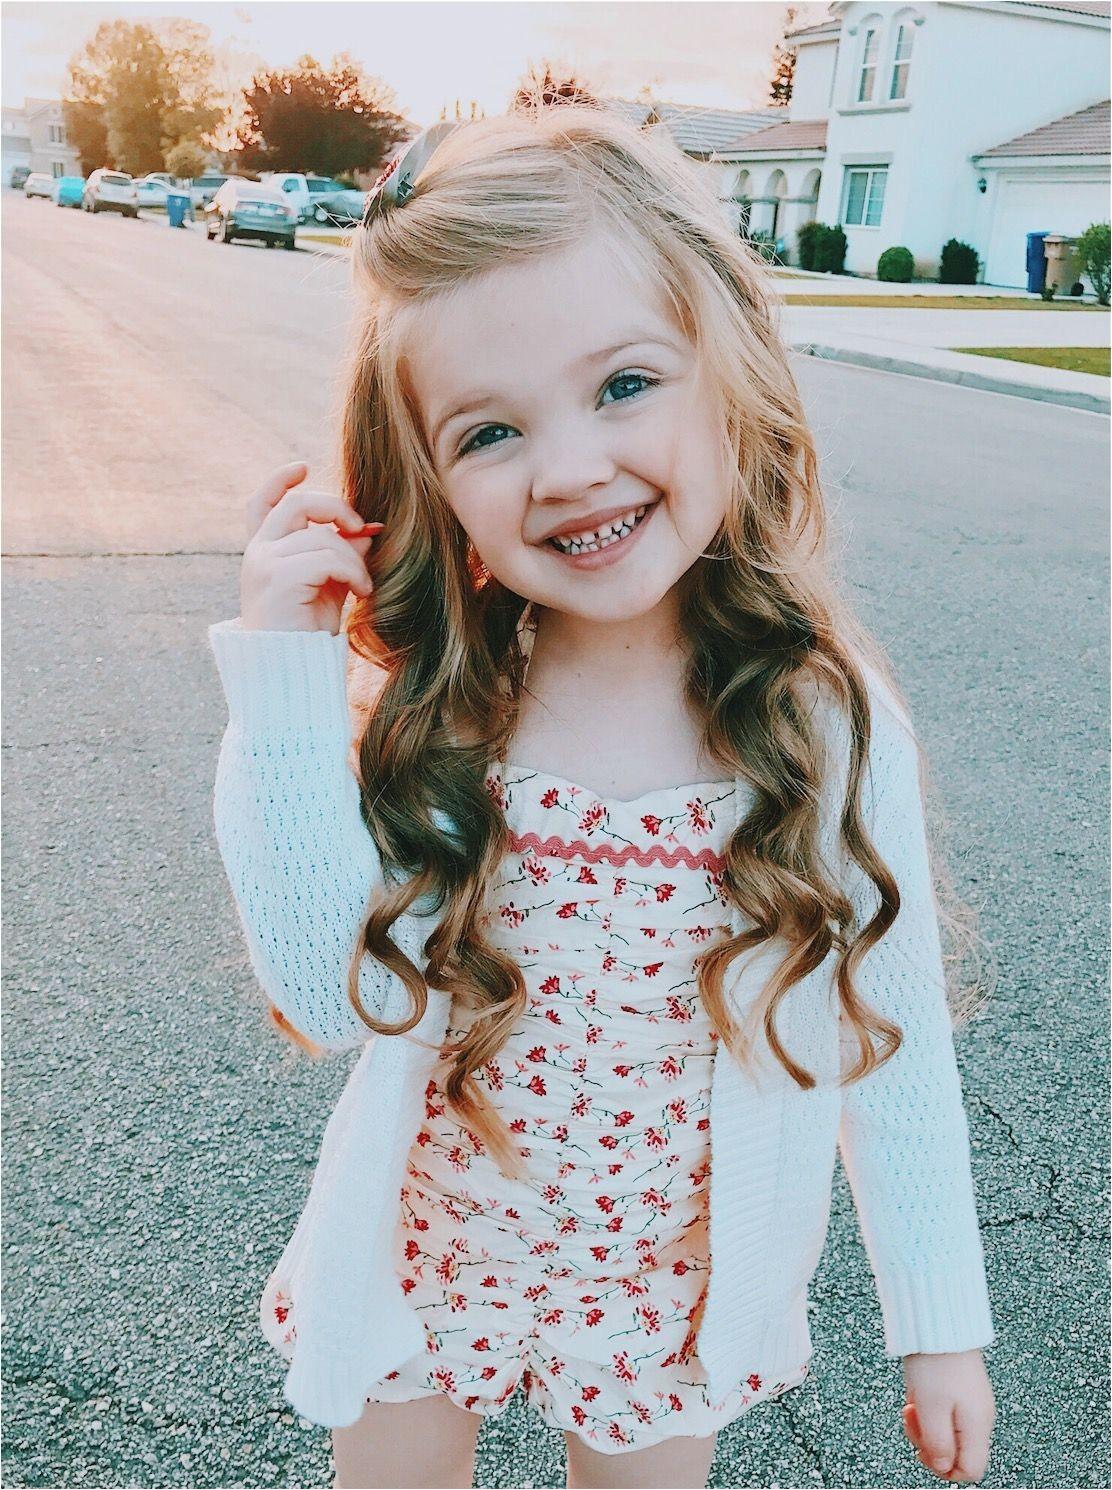 Little girl hairstyle long hair curls curled wavy beach waves